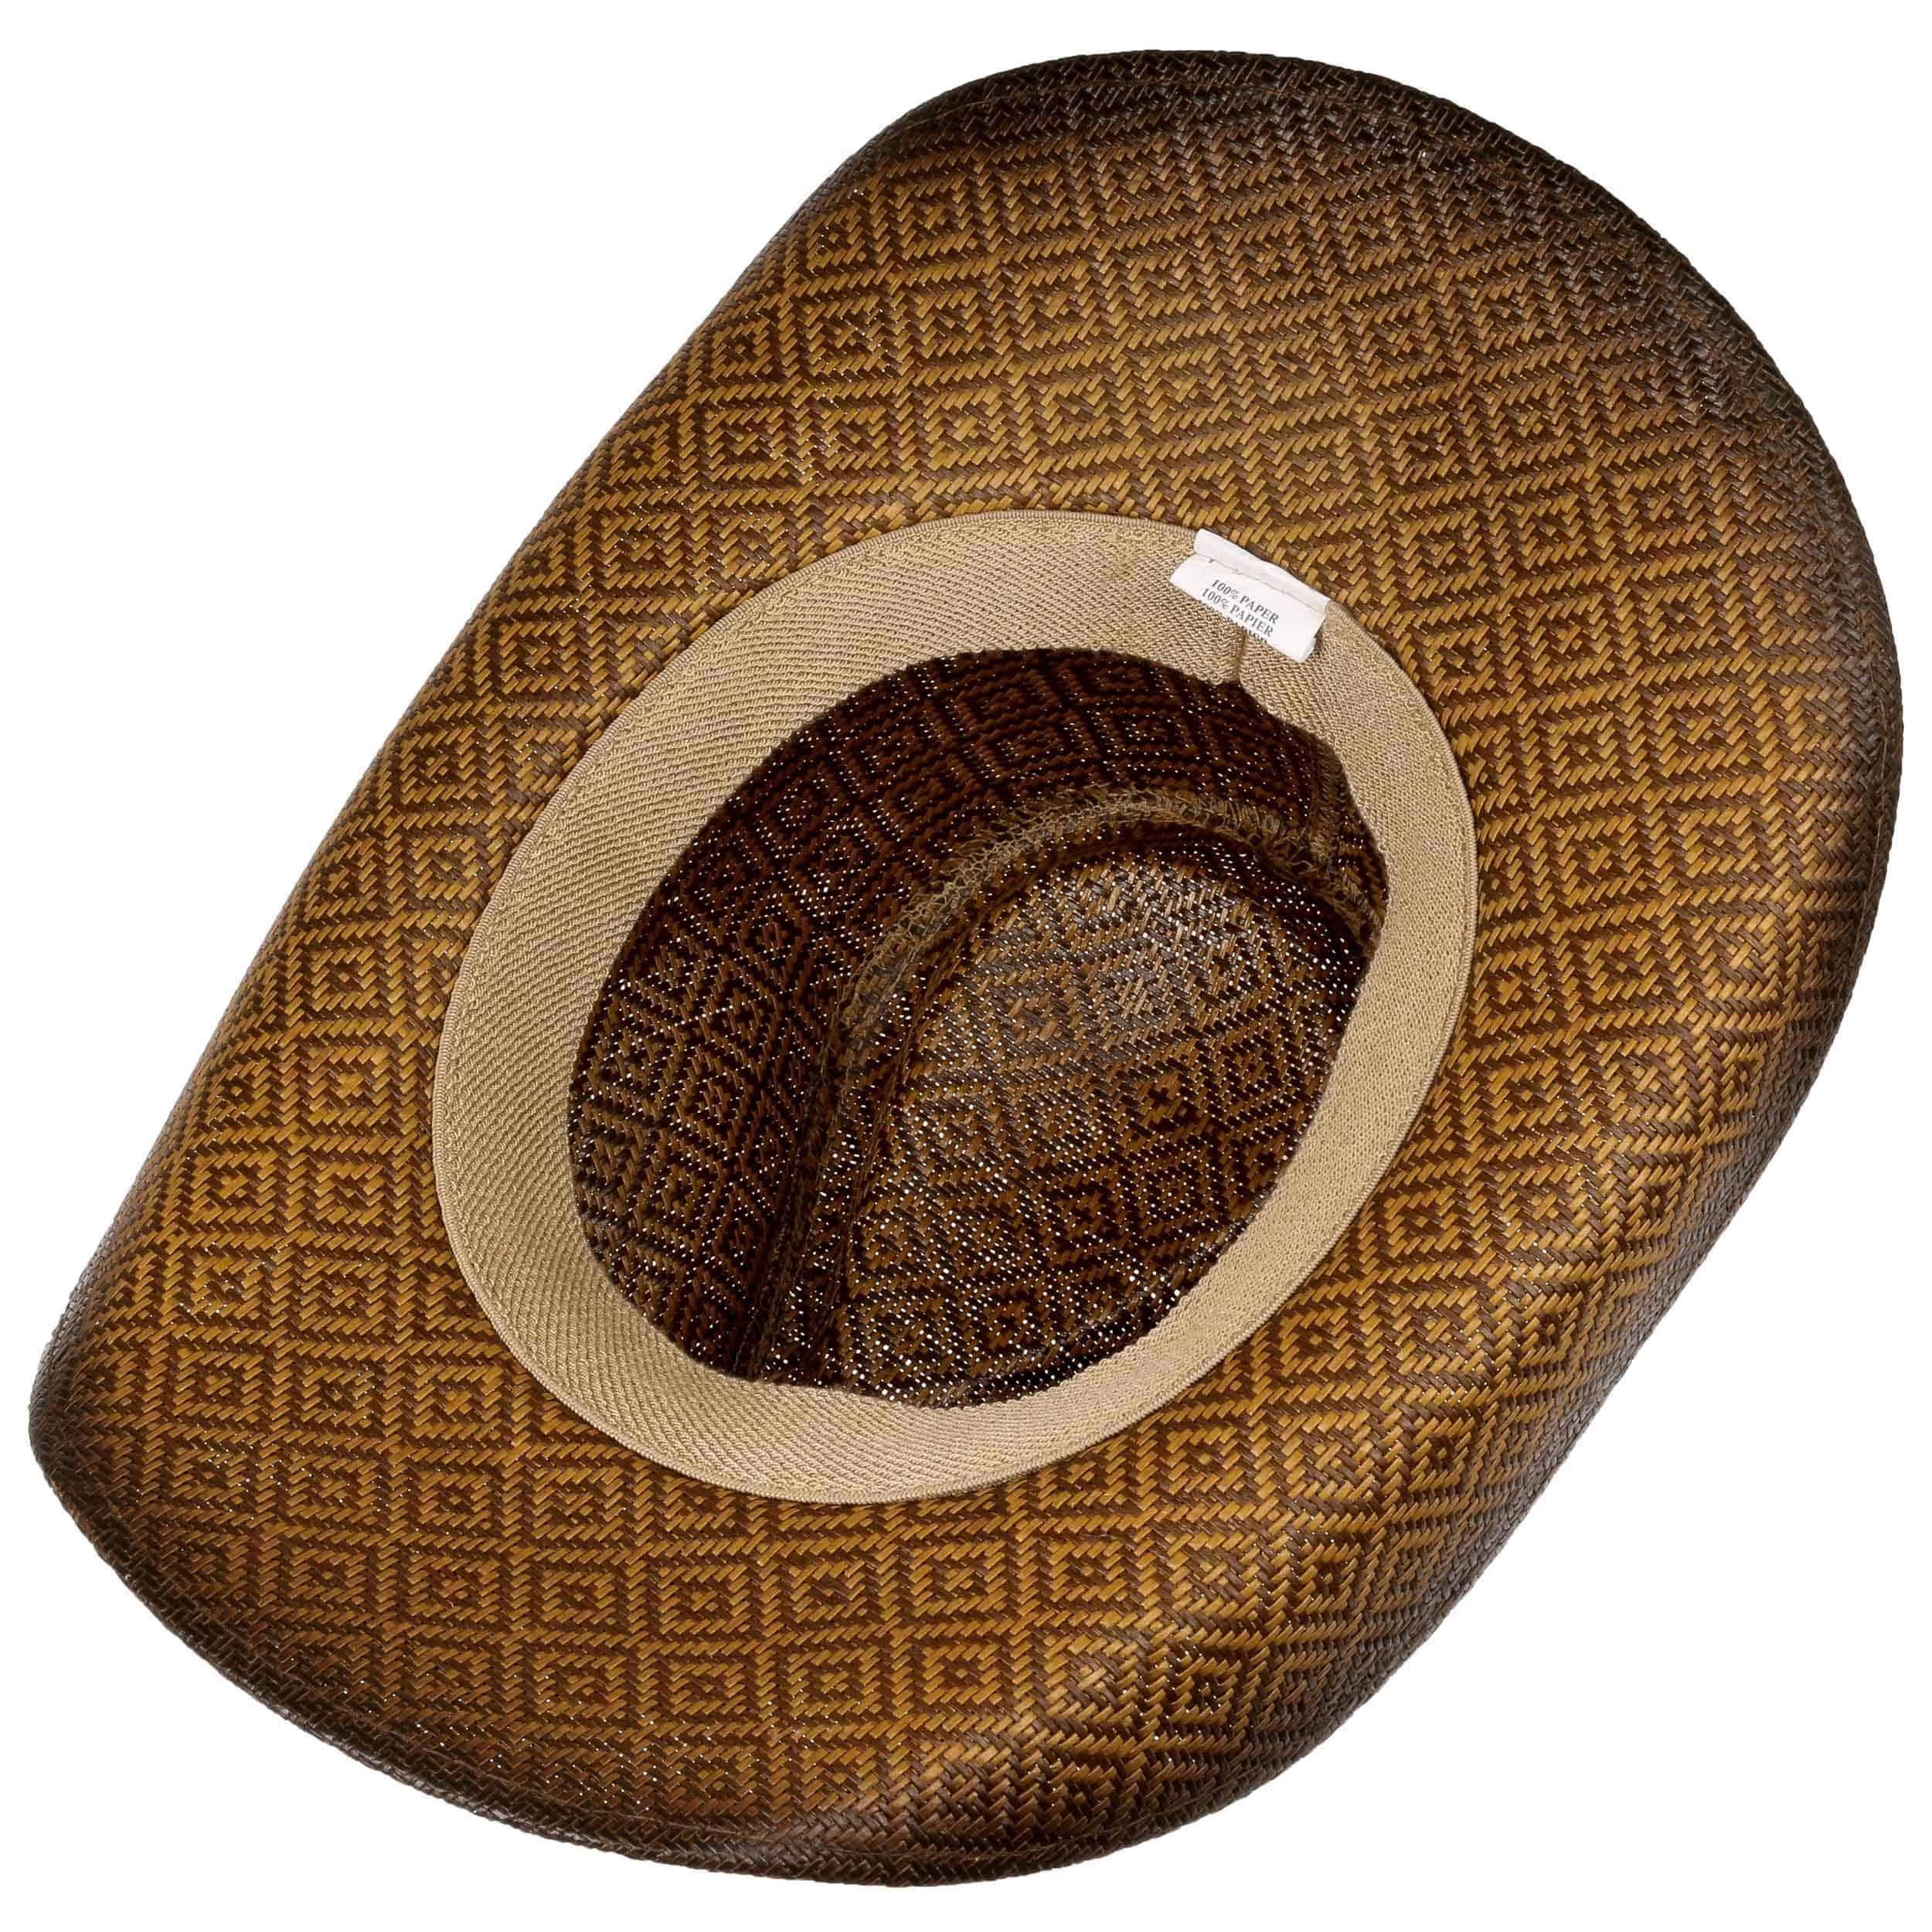 ... Cappello da Cowboy Squares by Lipodo - marrone 2 ... e312a2a29827